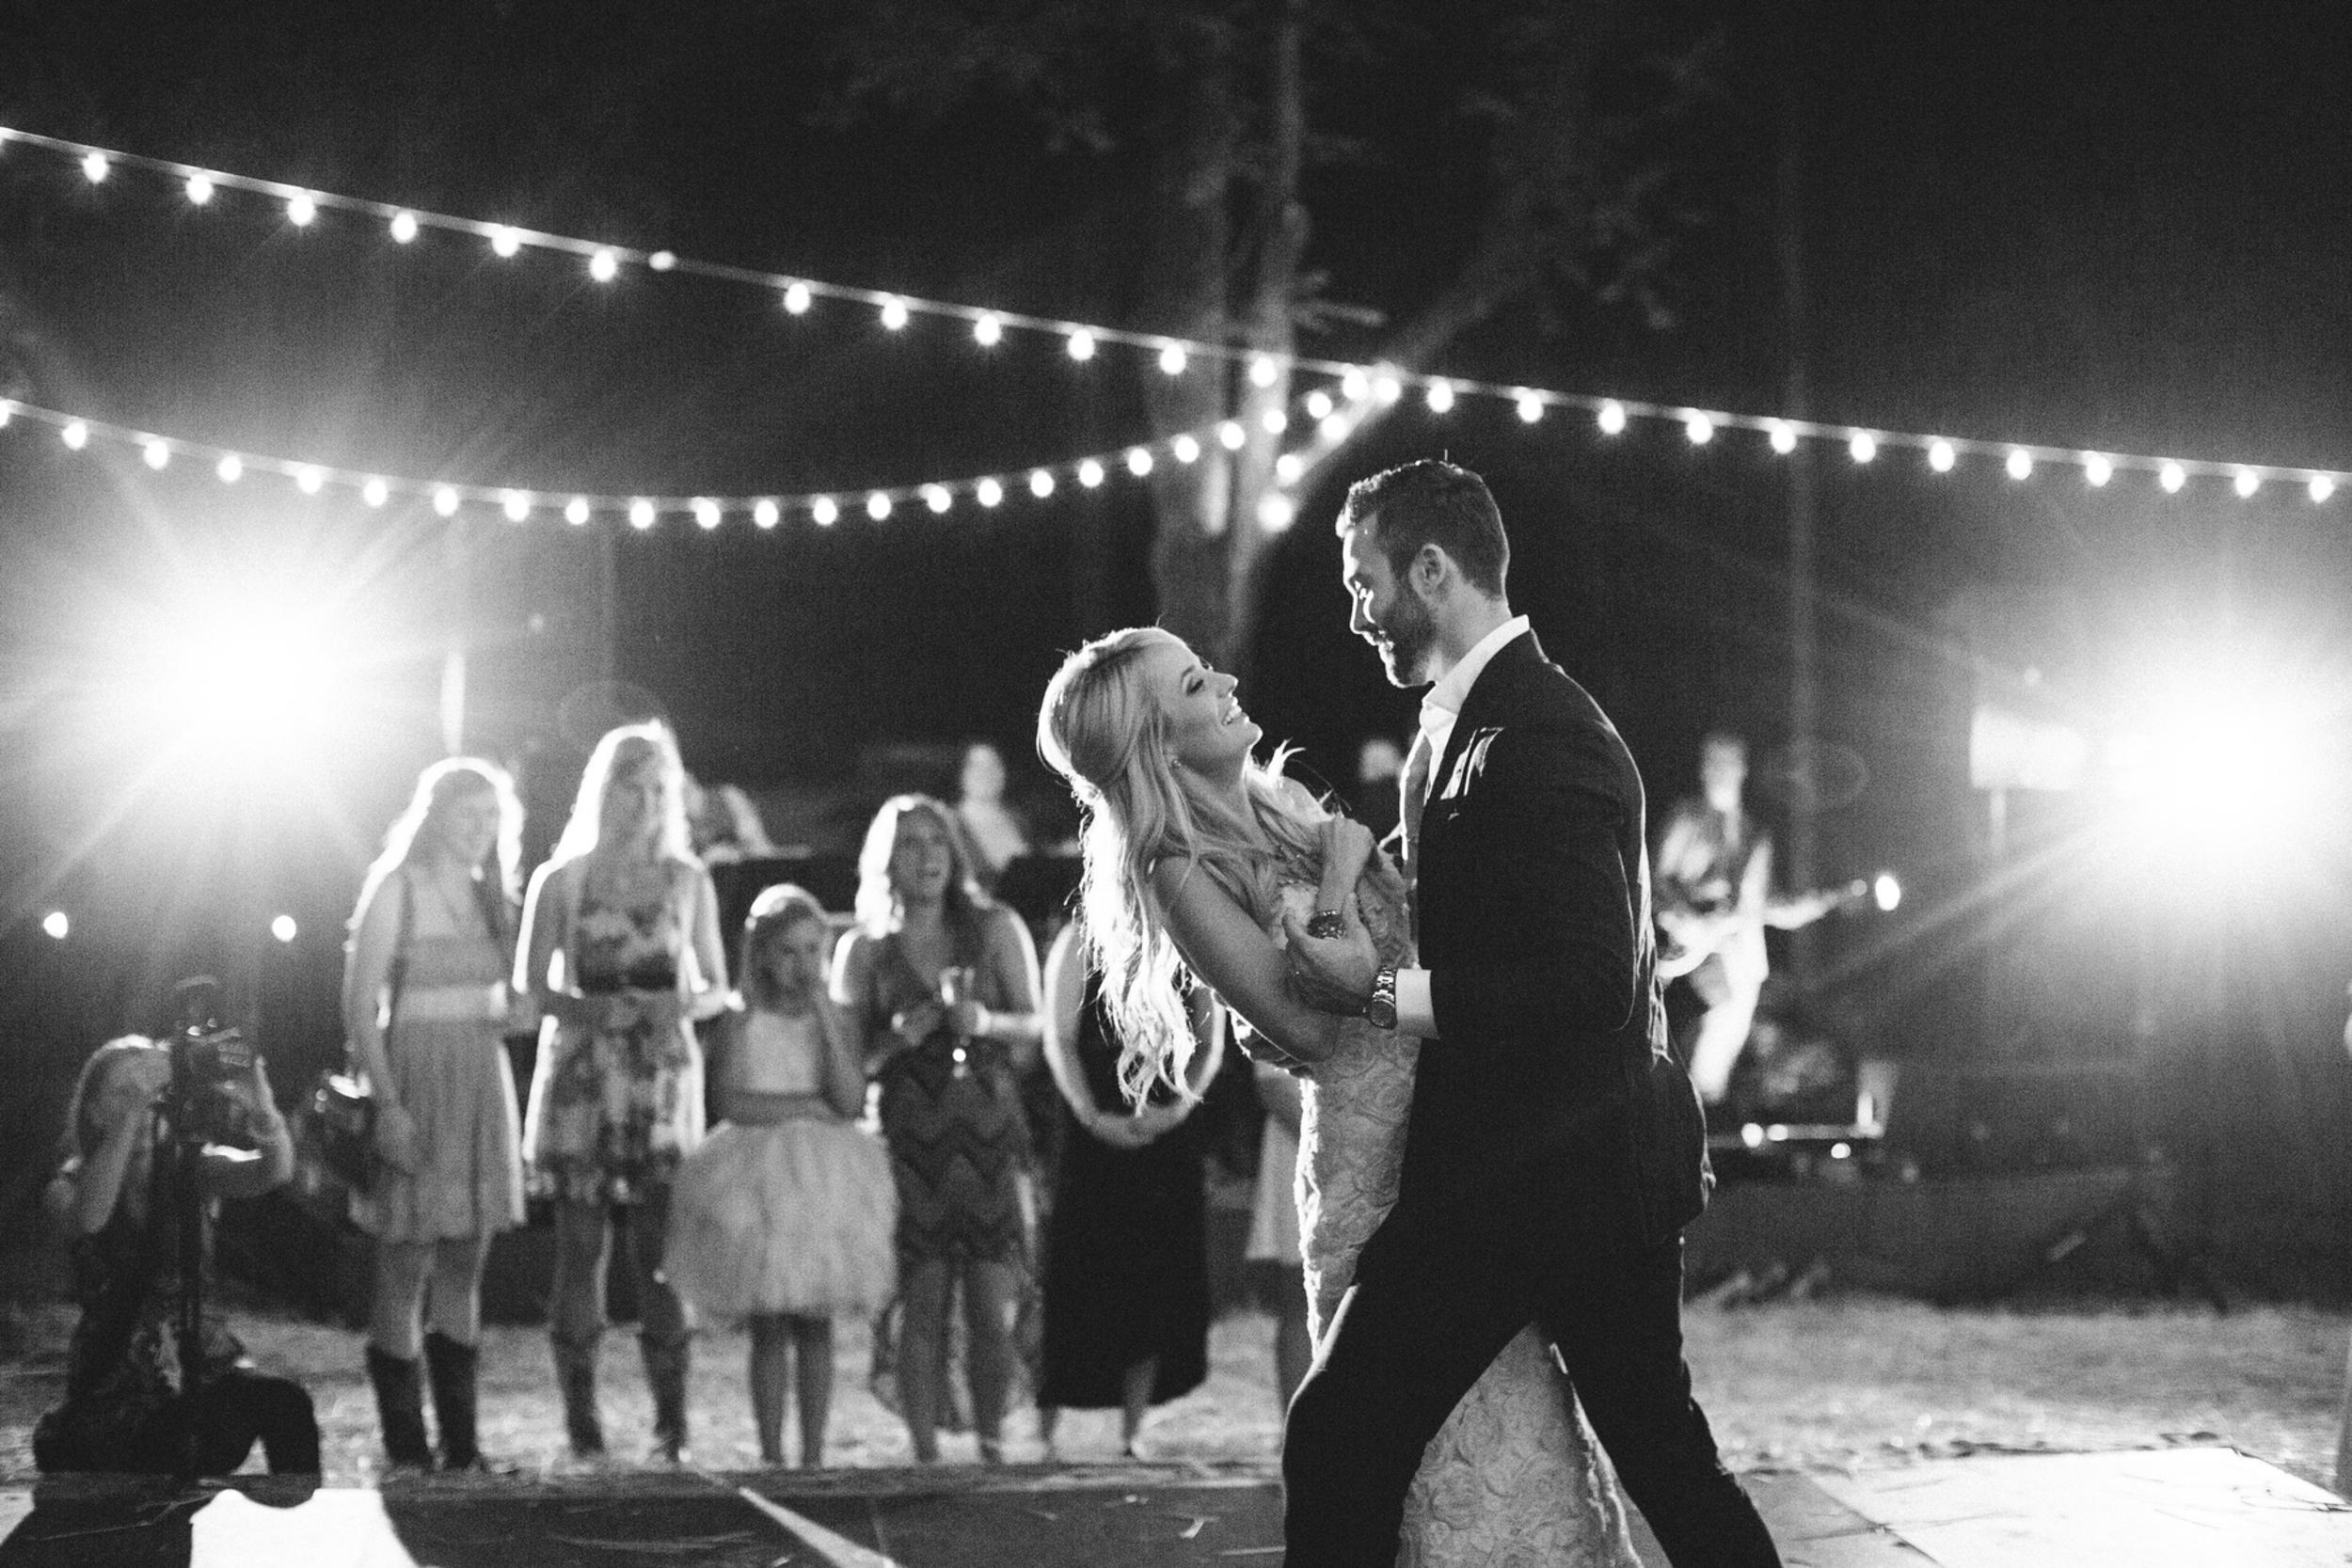 south_carolina_farm_wedding_rustic_chic_surprise_secret_luxe_wedding_bachelorette_emily_maynard_real_weddings-14.jpg